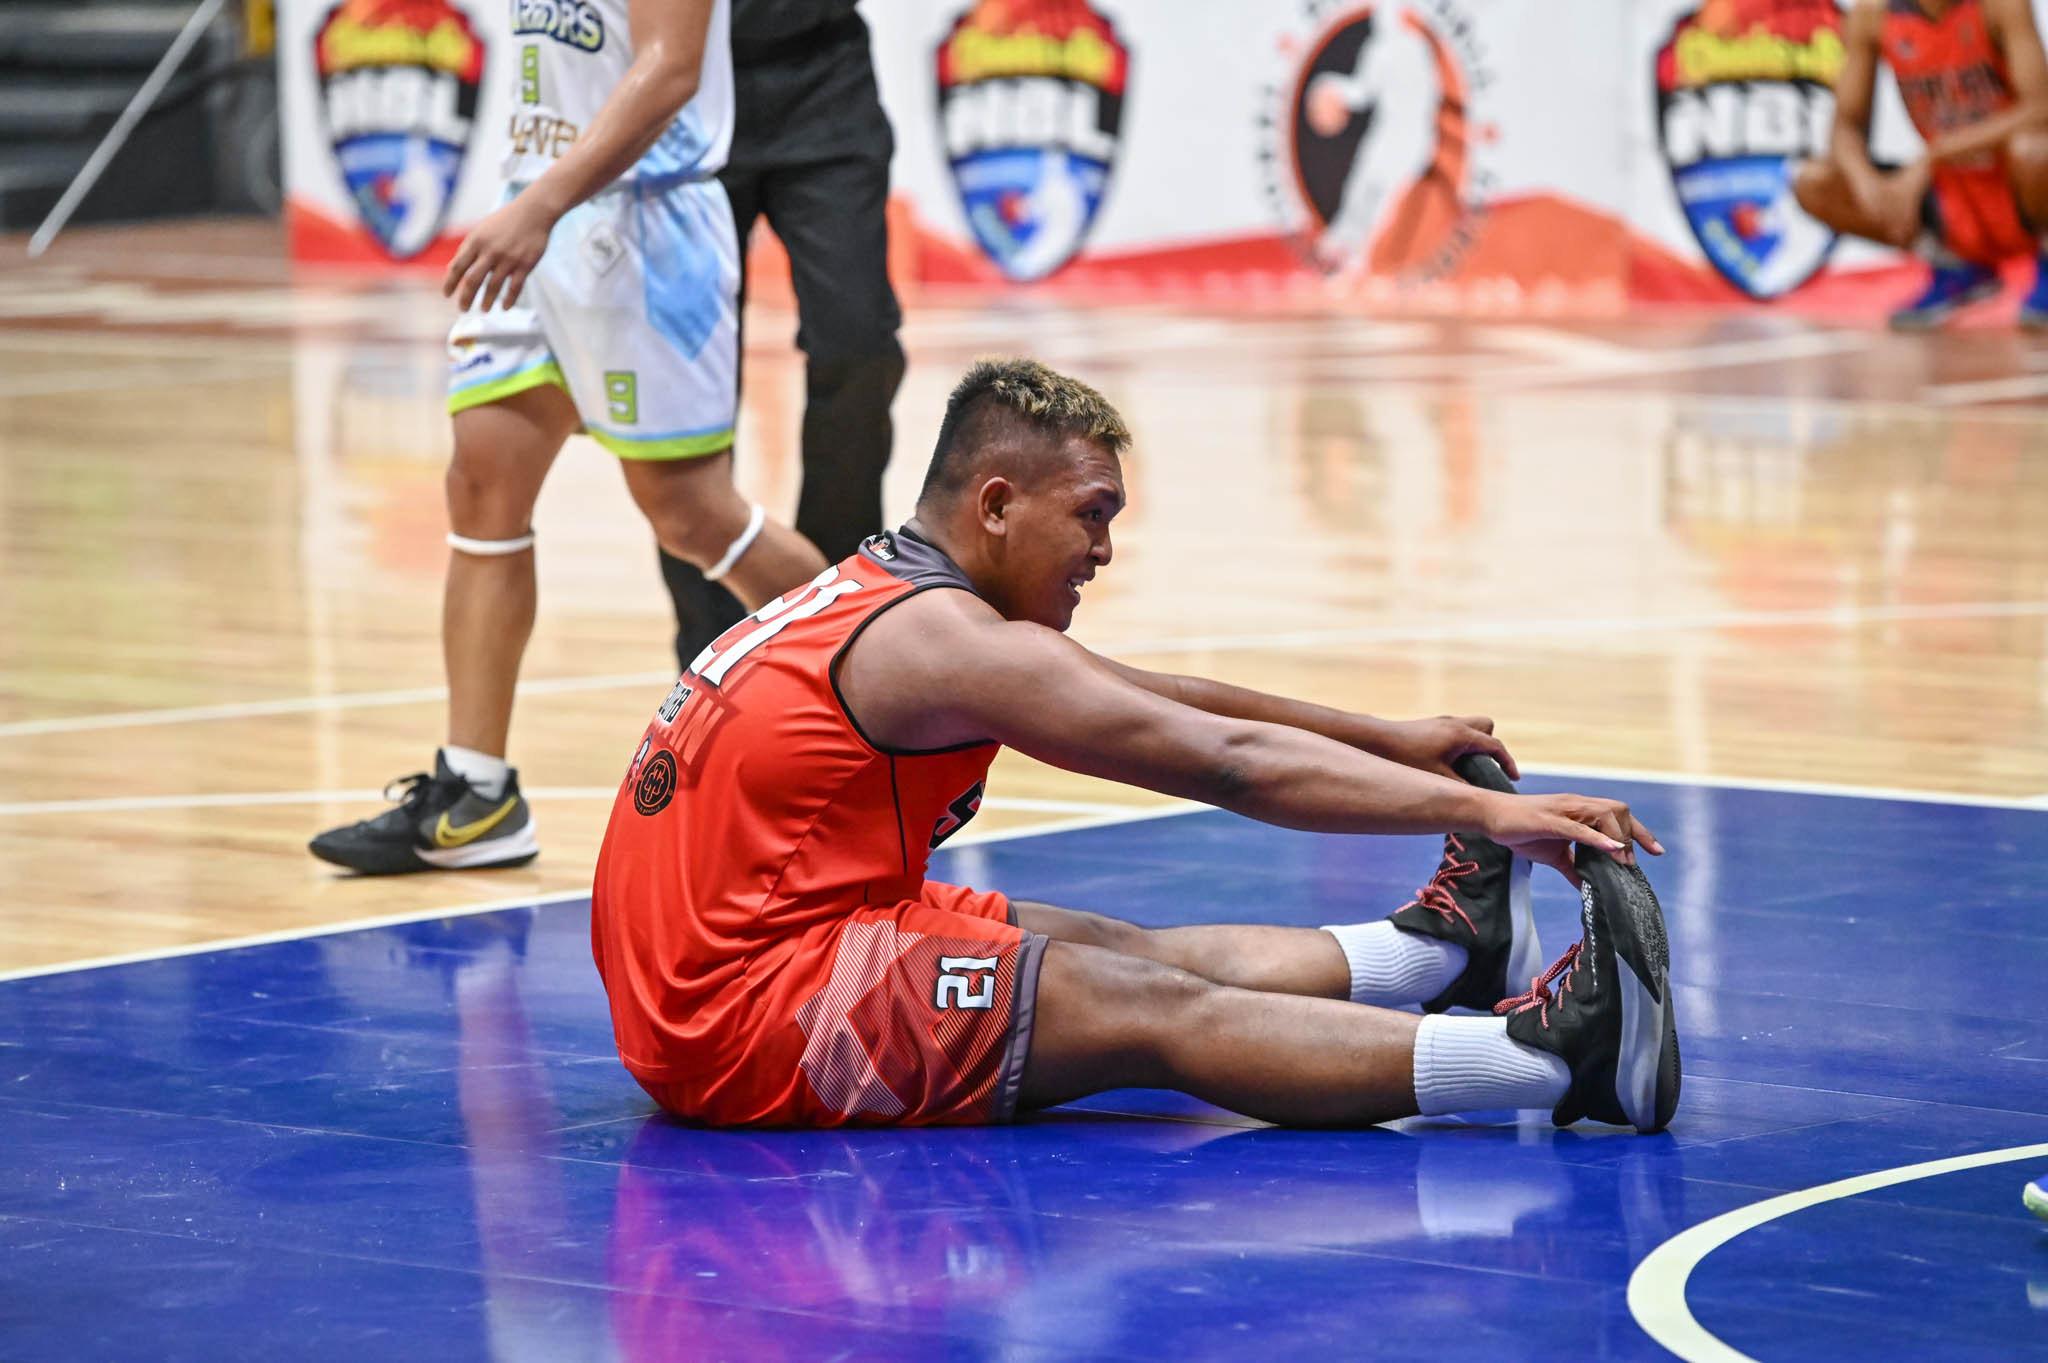 2021-Chooks-to-Go-NBL-Muntinlupa-vs-Quezon-D4-Kheth-Guiab Enguio, Mendoza stamp class, lead Muntinlupa to rousing NBL debut Basketball NBL News  - philippine sports news